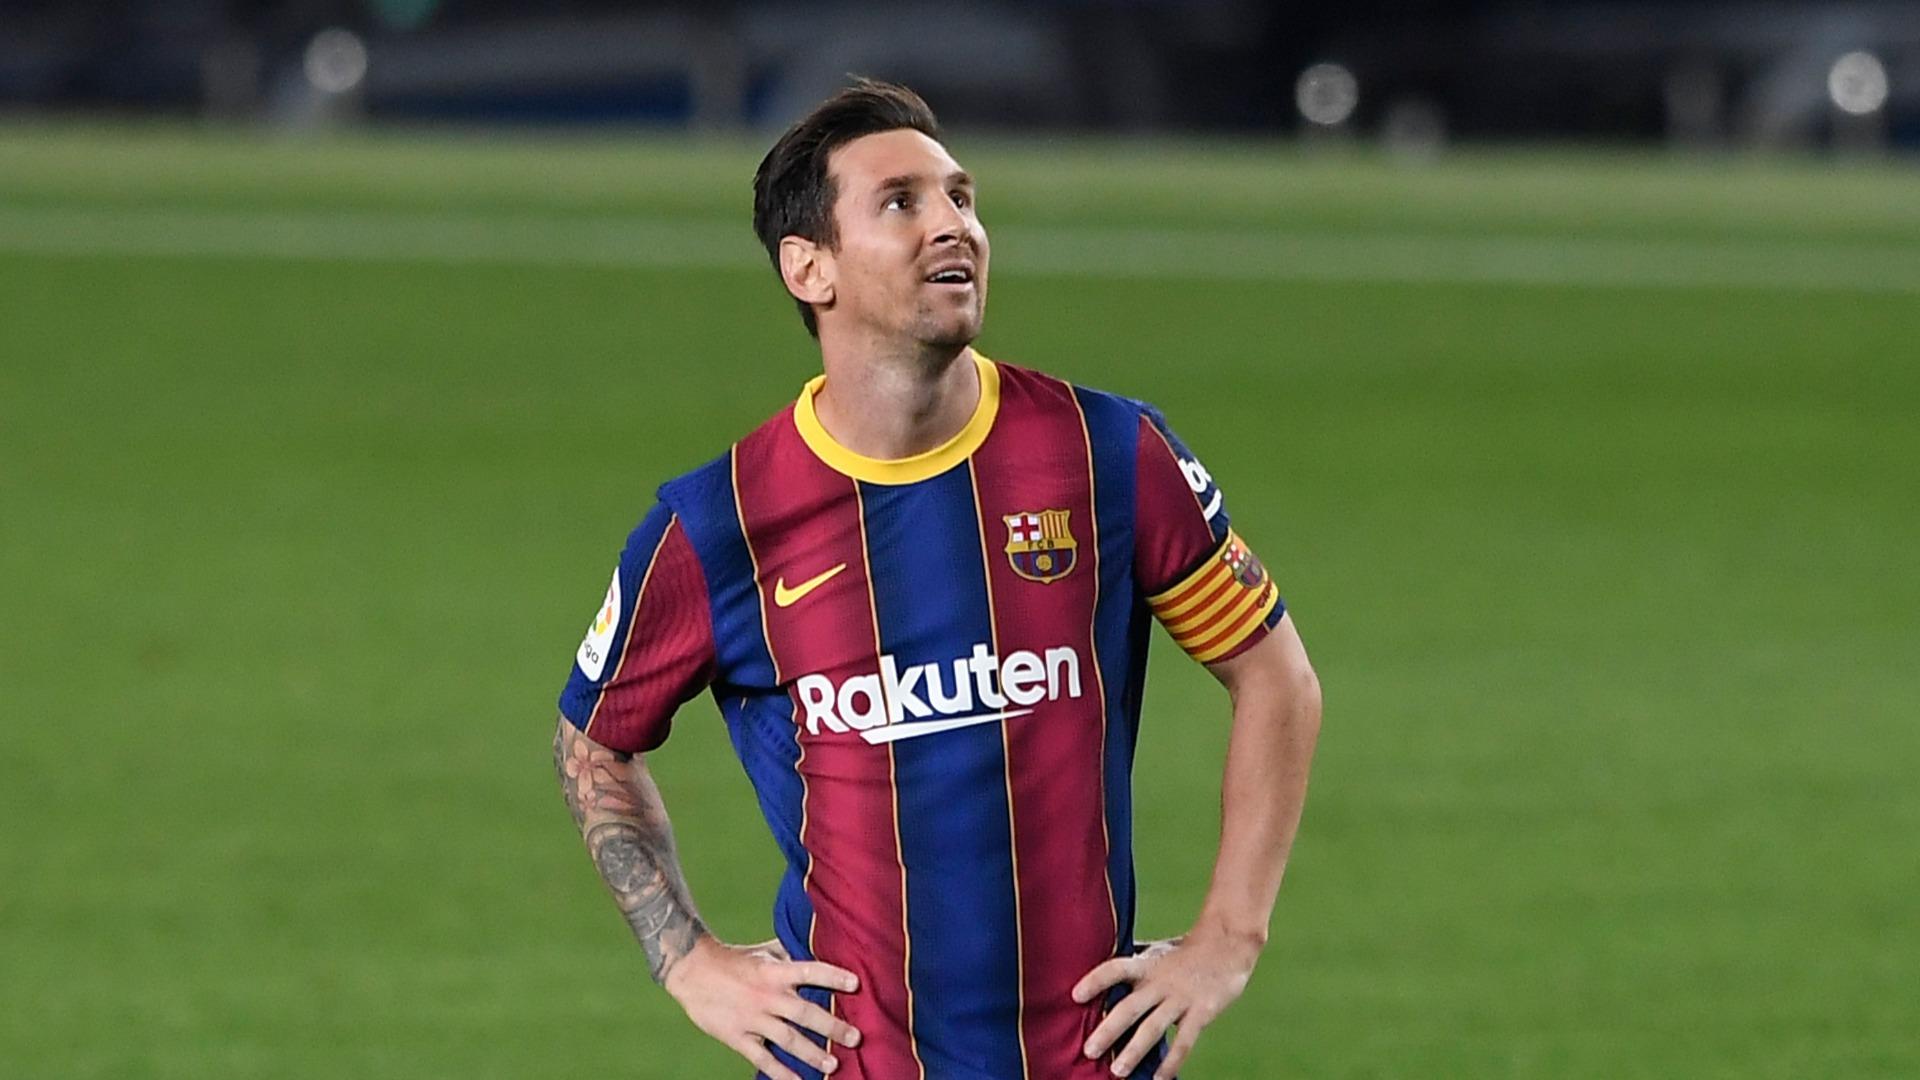 Messi wants more than money at Barcelona – Laporta